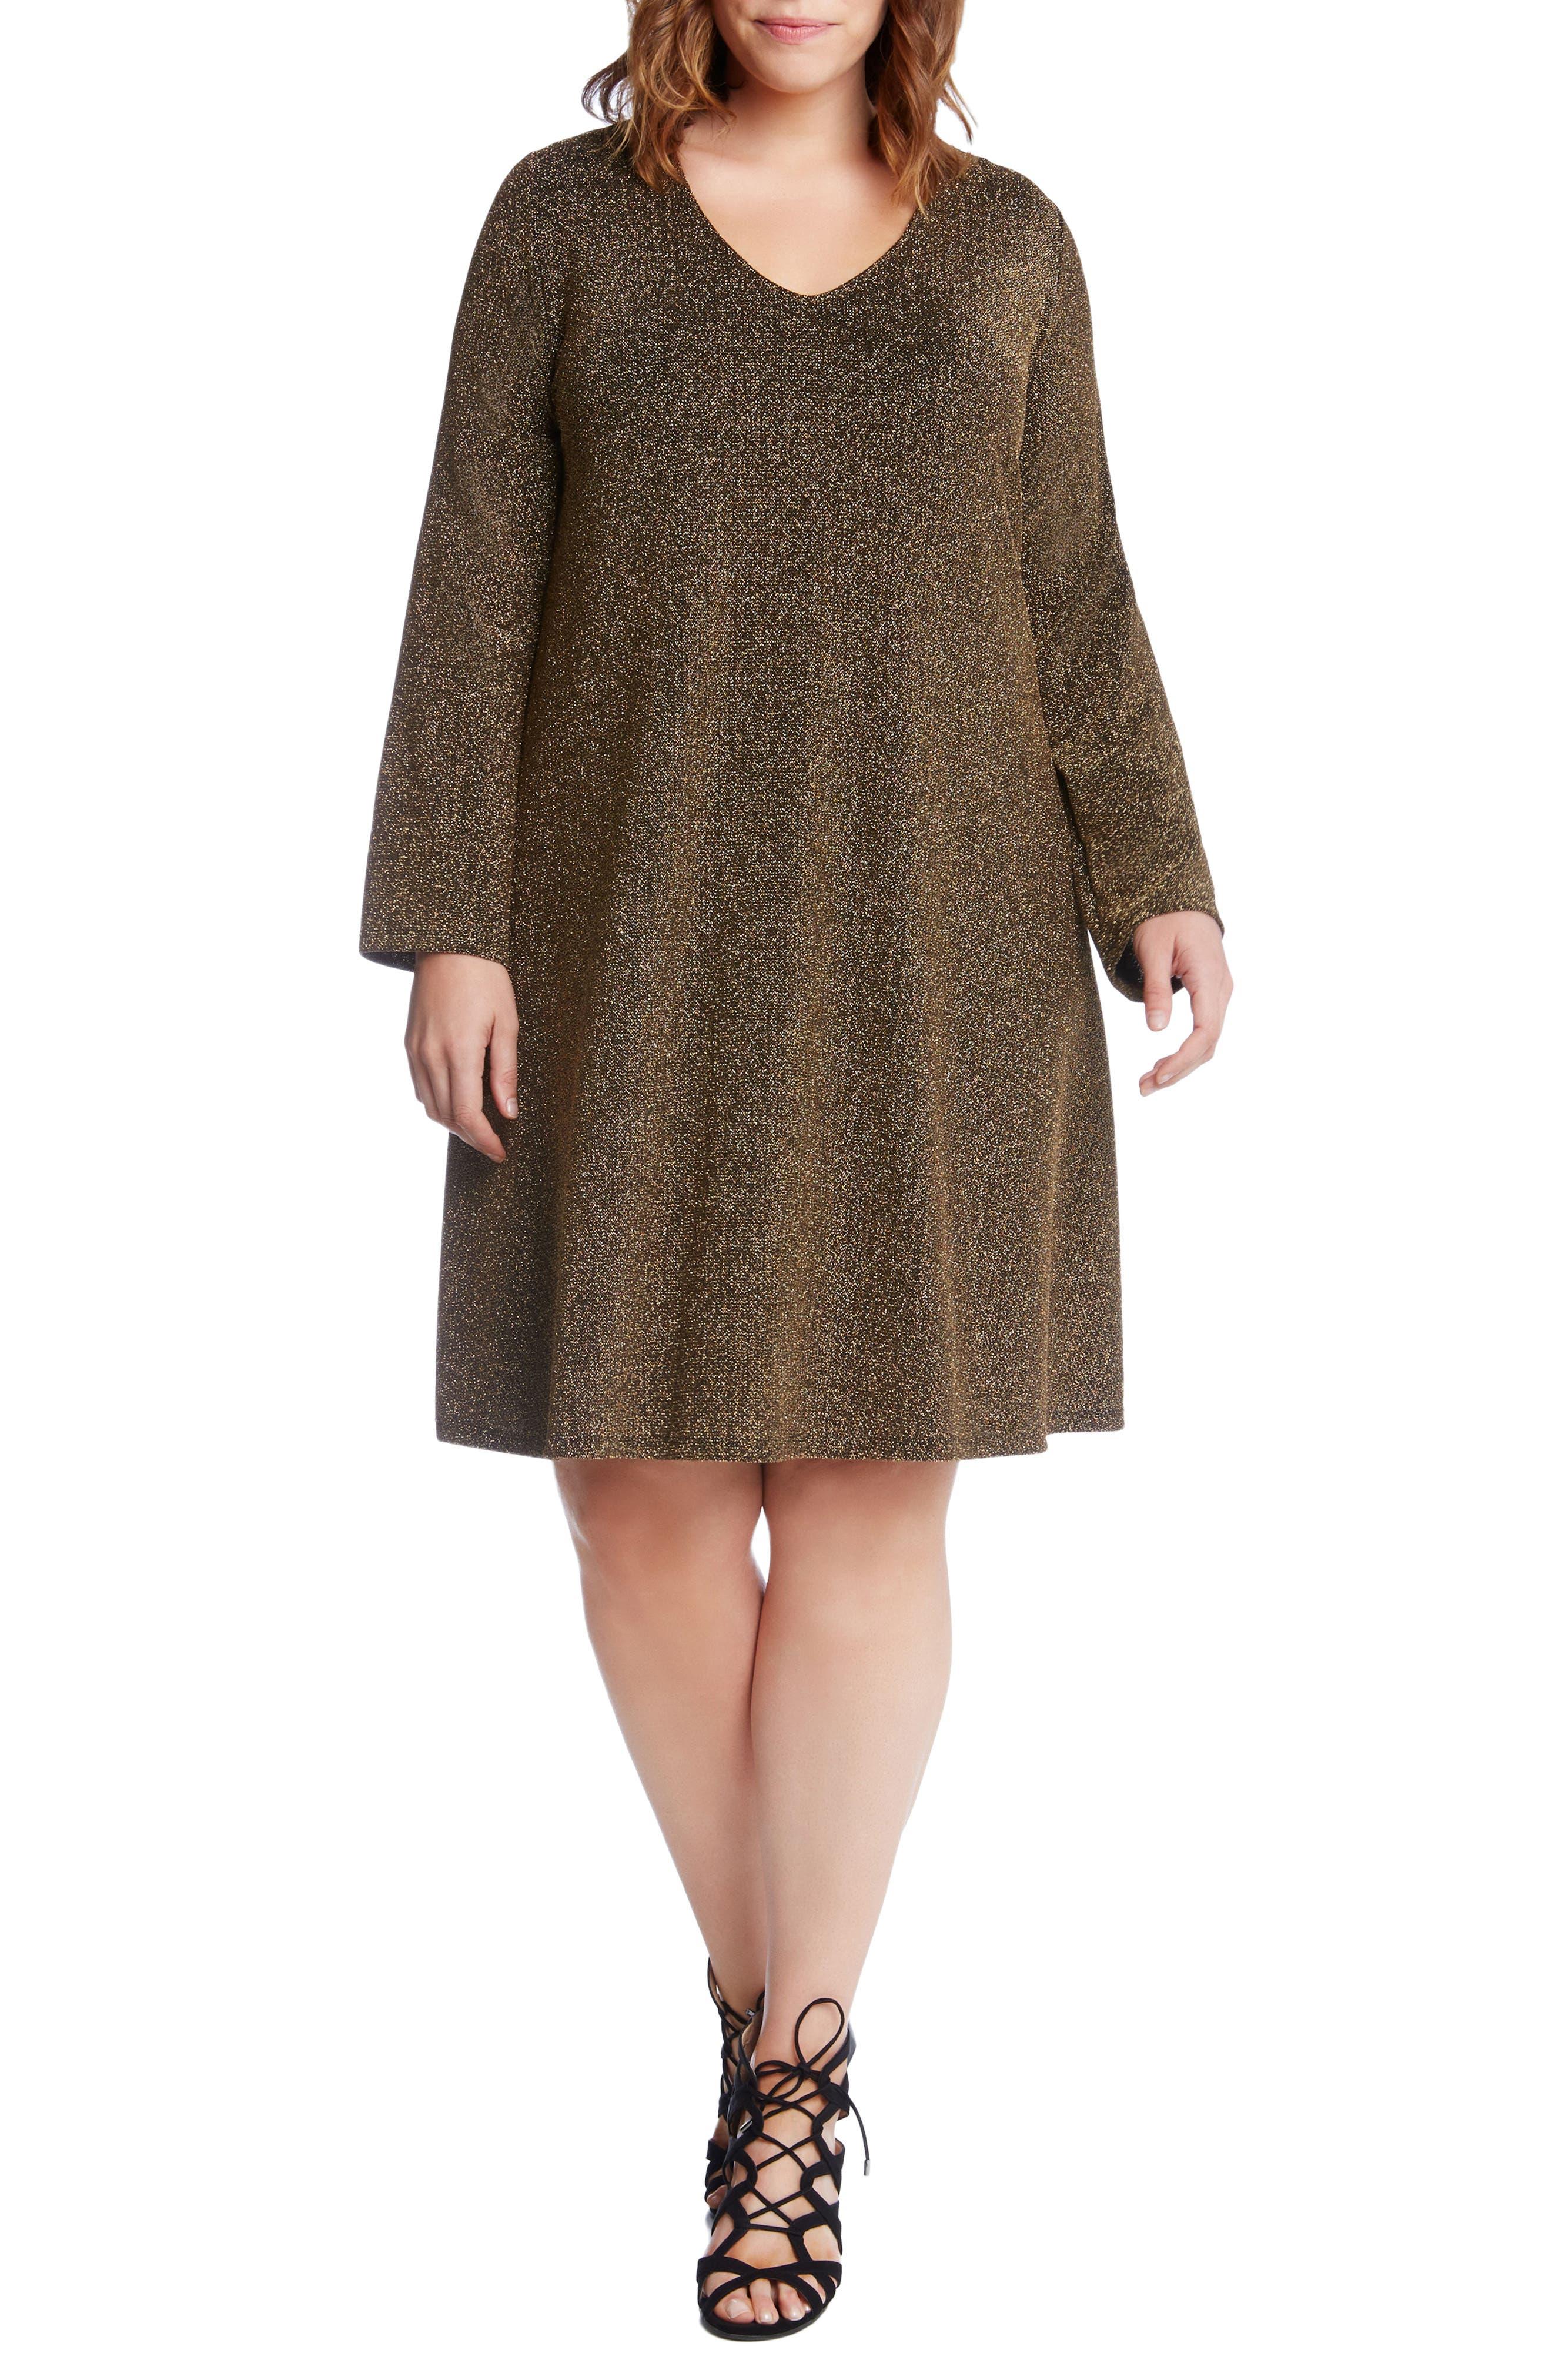 Taylor Gold Knit Dress,                         Main,                         color, Gold